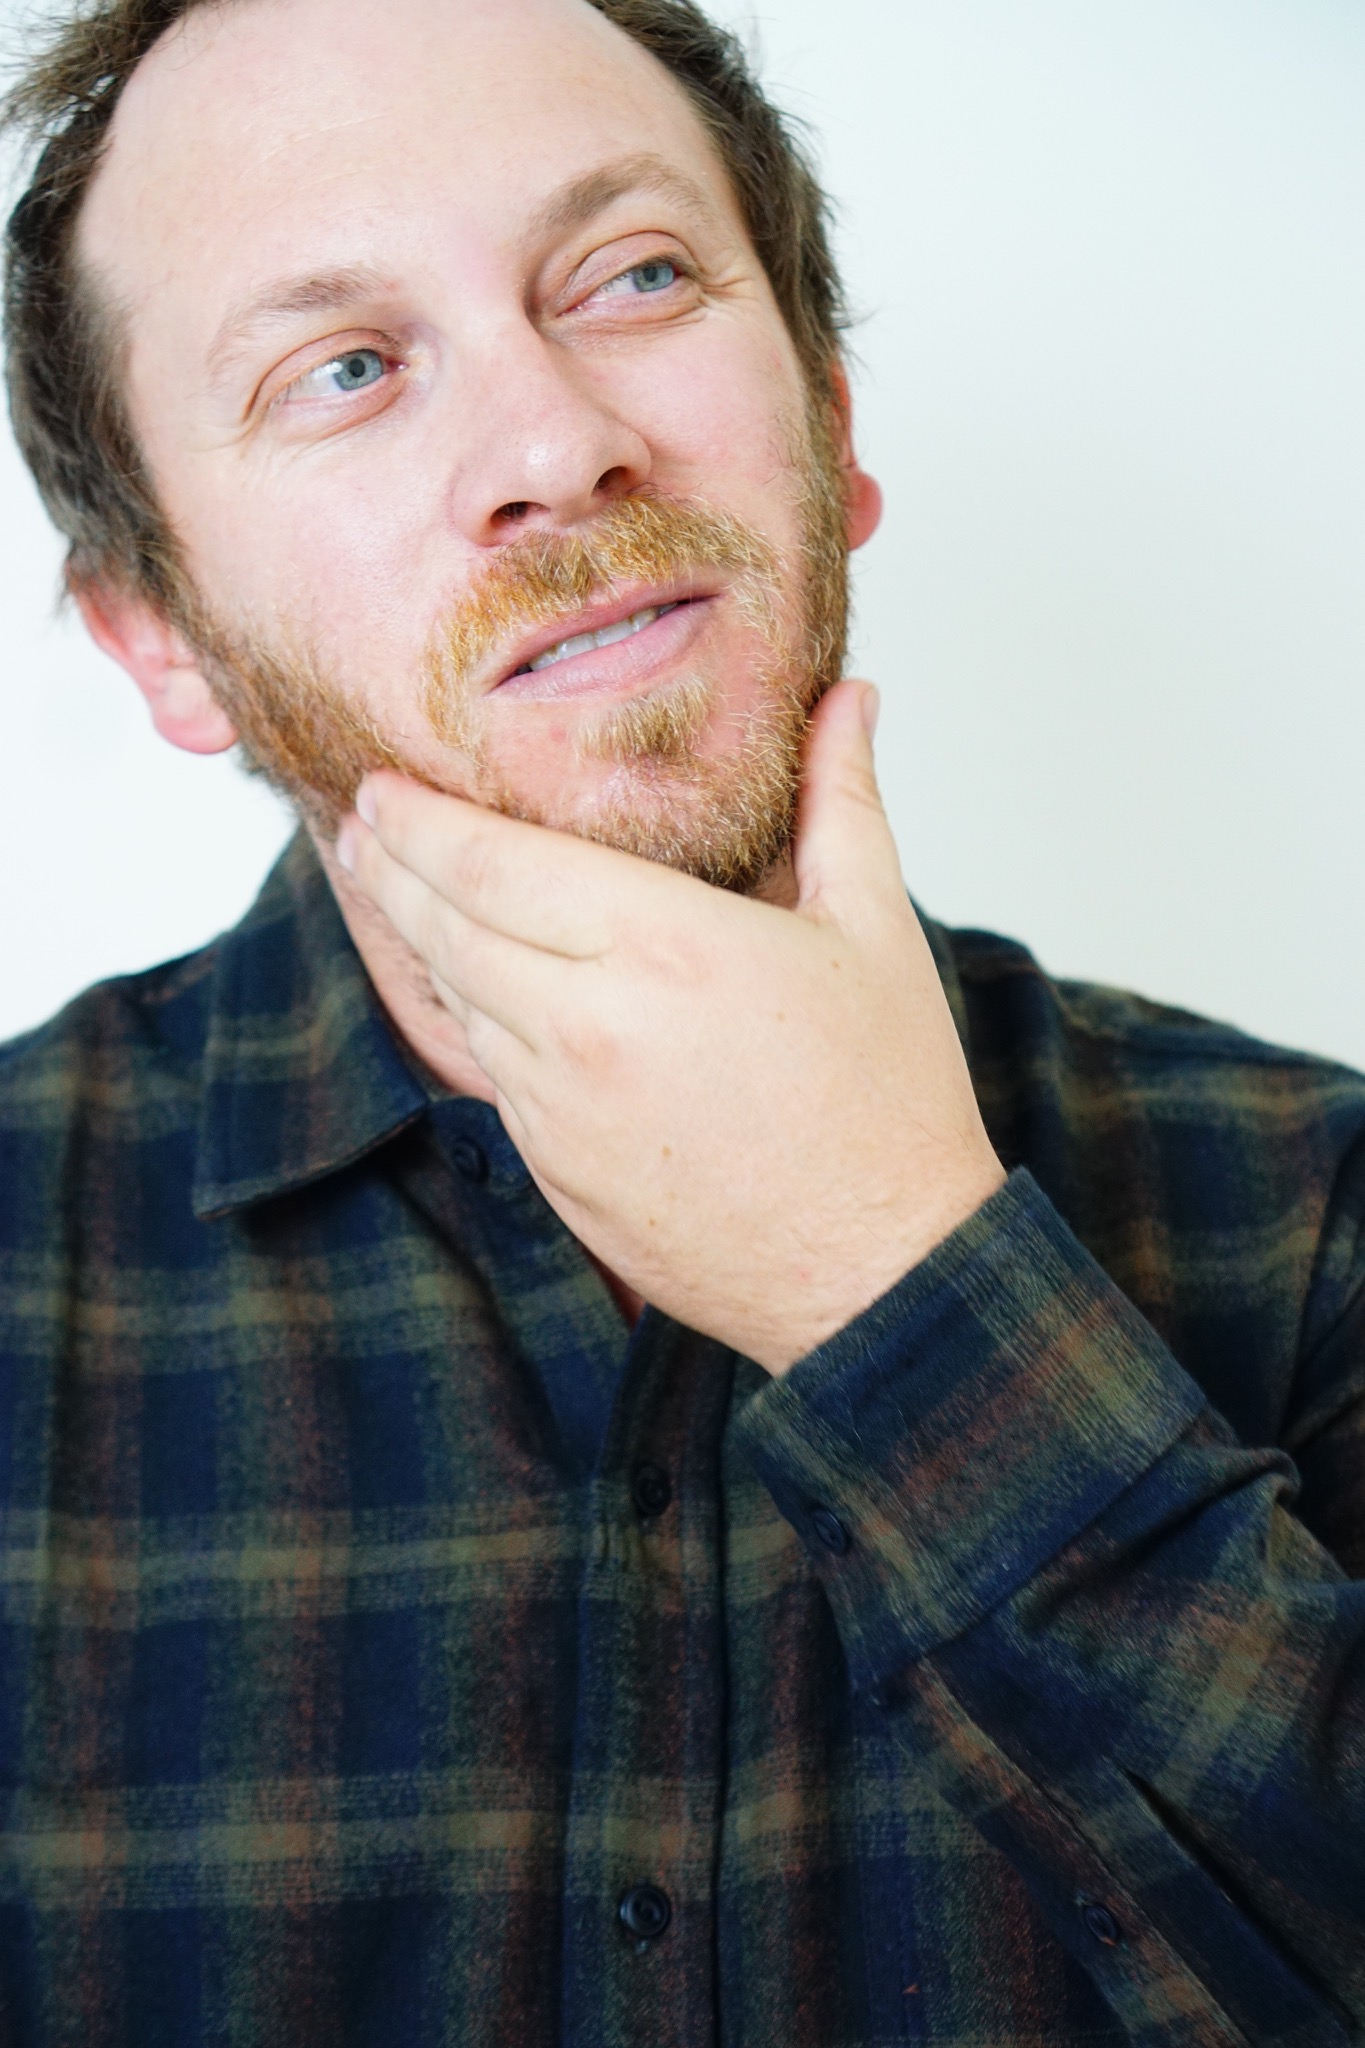 Stocking Stuffer Idea - Lovely Beards